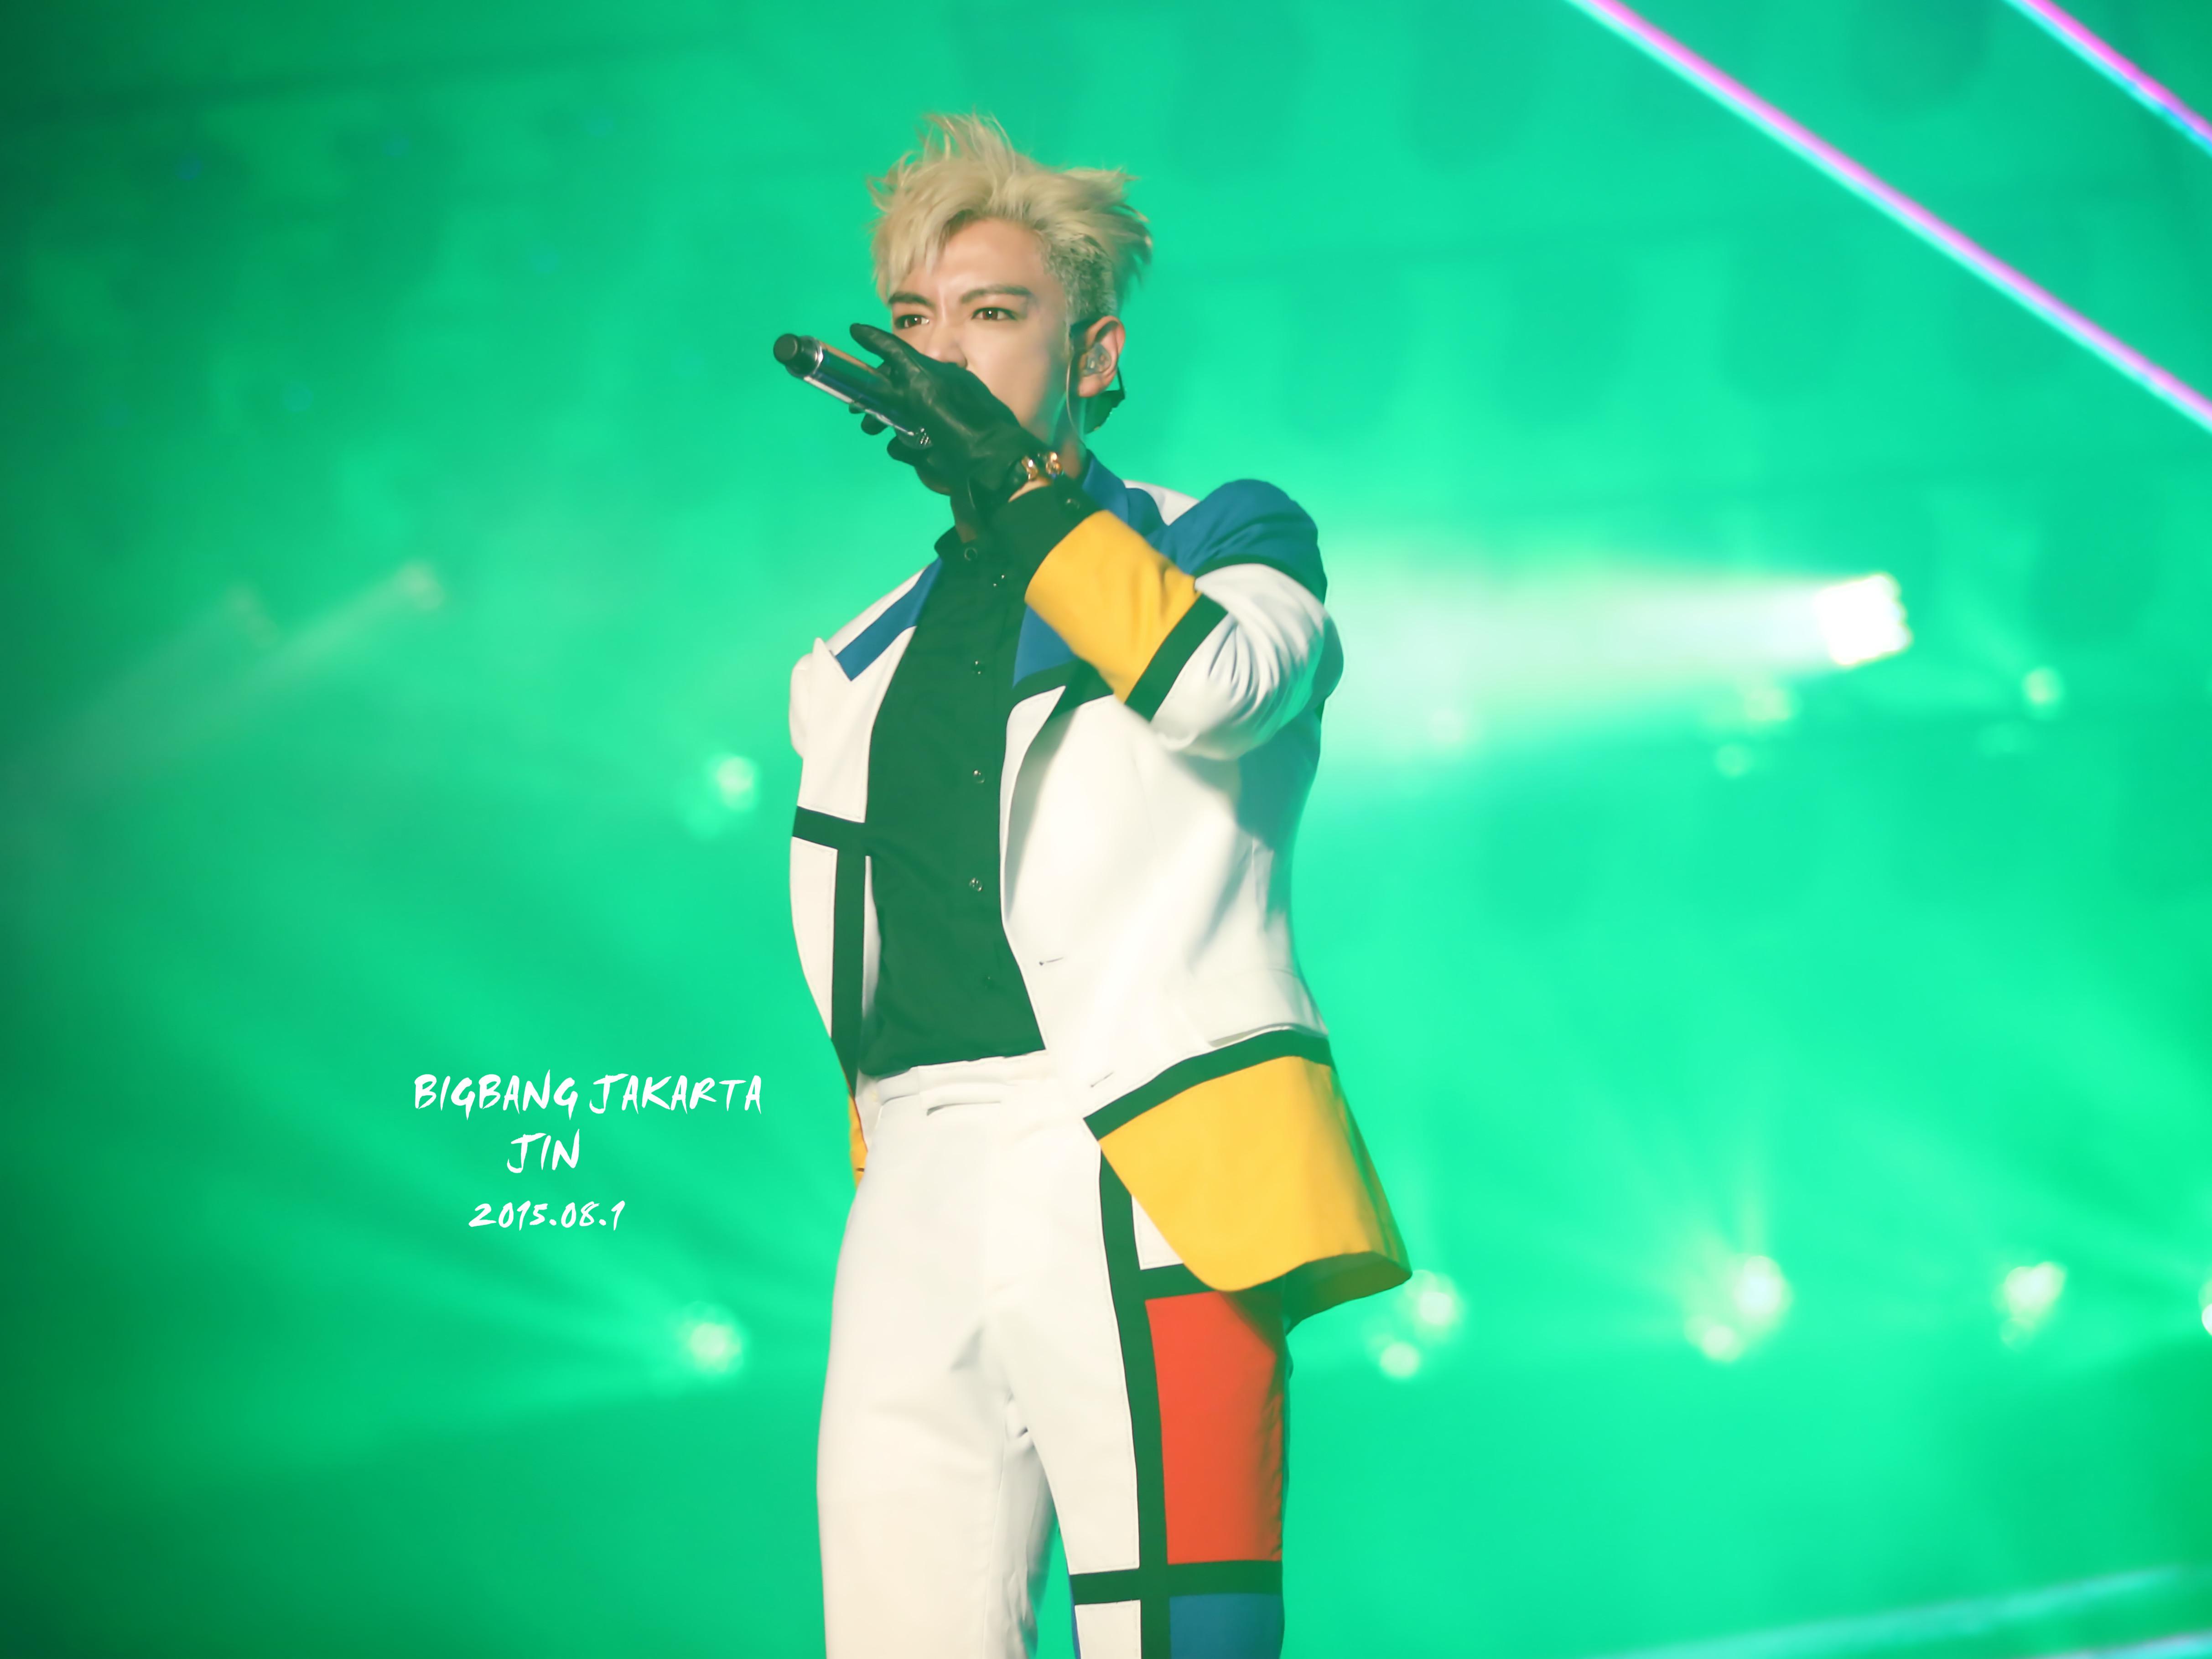 BIGBANG - Made Tour 2015 - Jakarta - 01aug2015 - Jin - 13.jpg